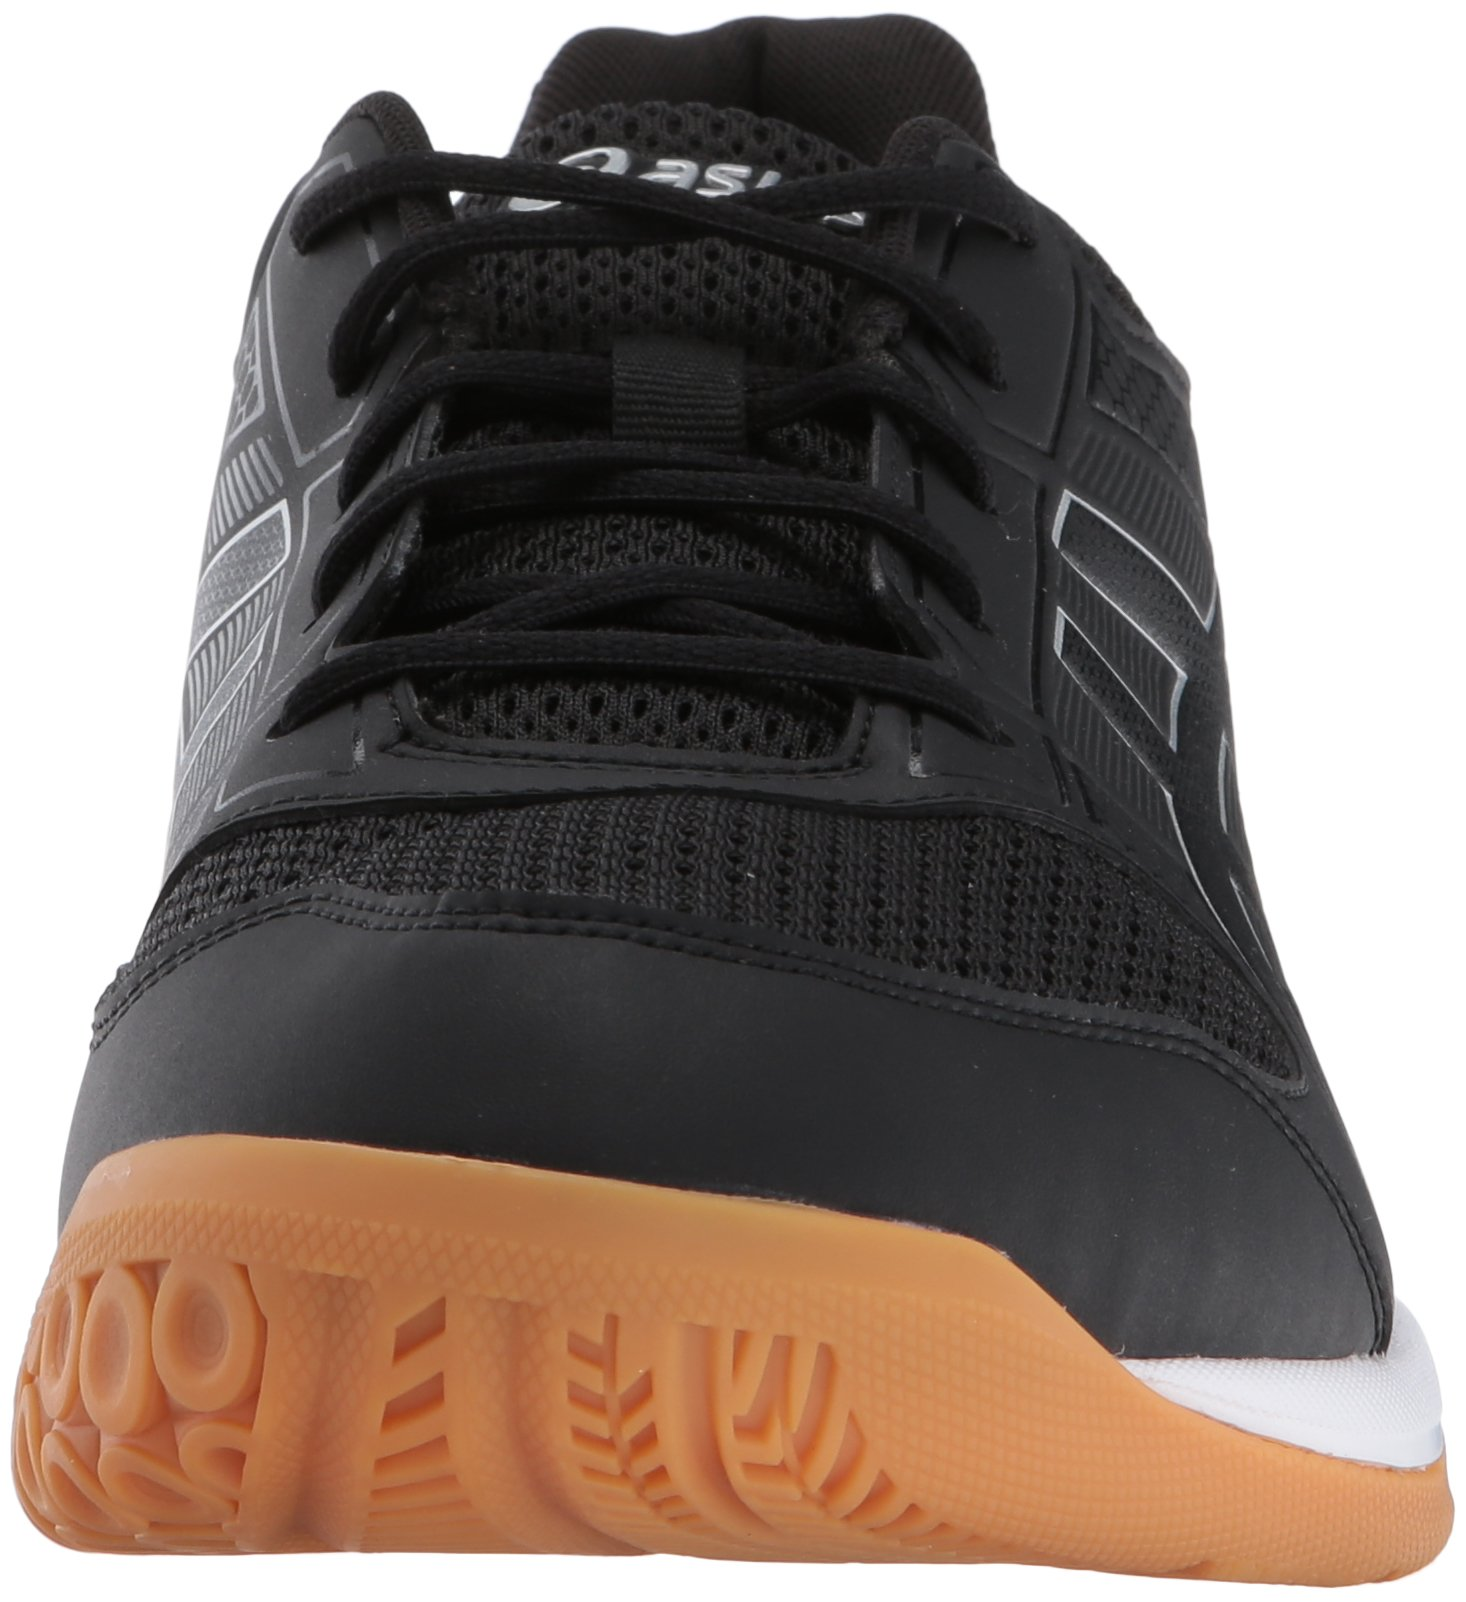 ASICS Mens Gel-Rocket 8 Volleyball Shoe Black/White, 7 Medium US by ASICS (Image #4)